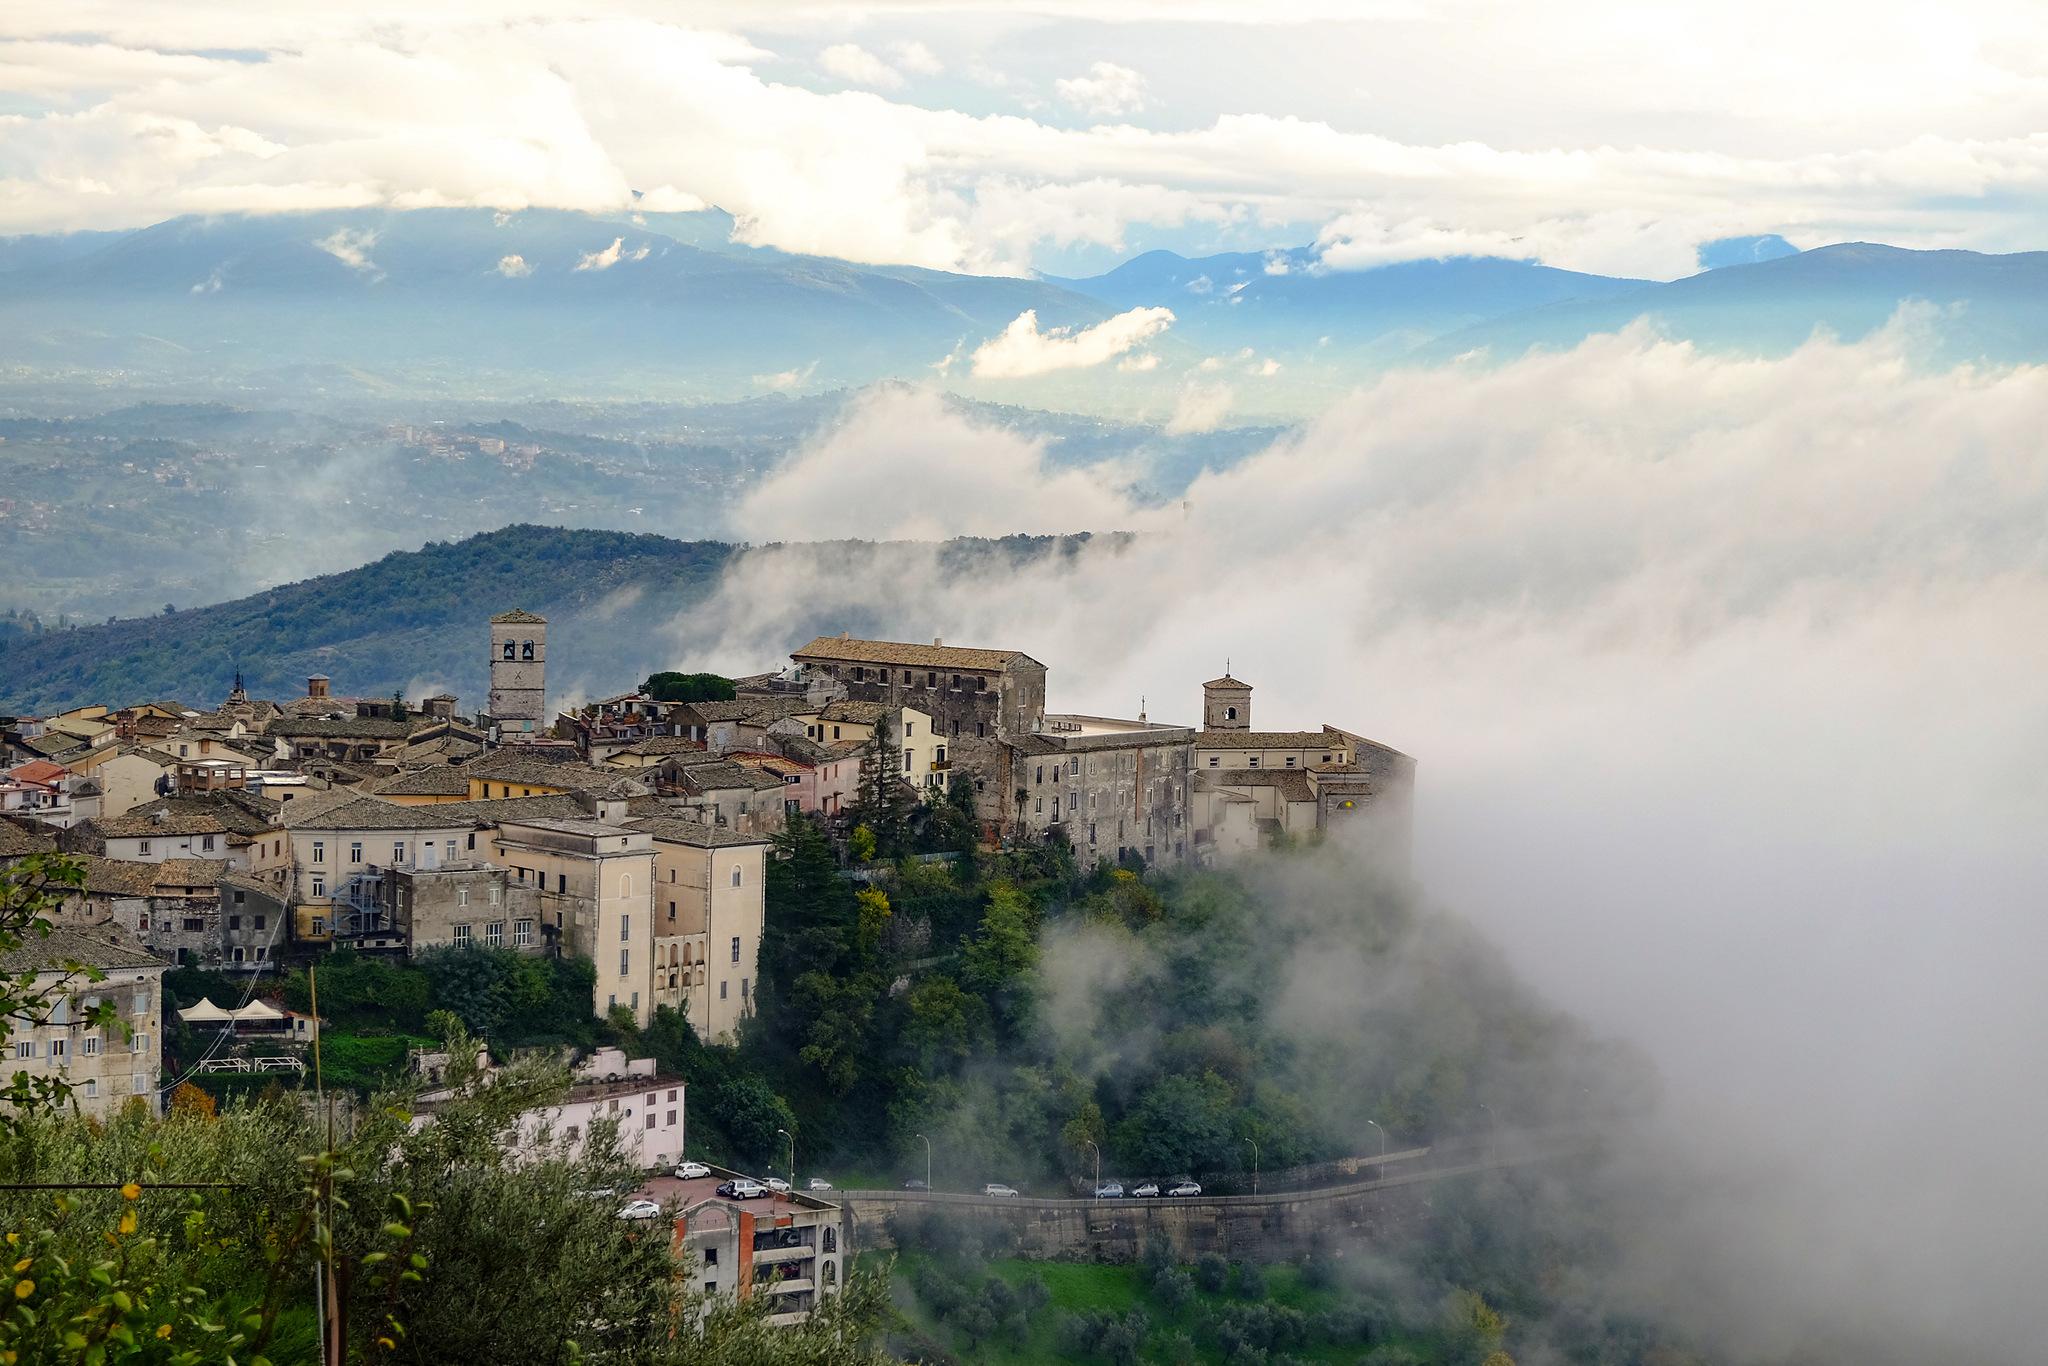 Concorso Fotografico Veroli by GianniAmadei